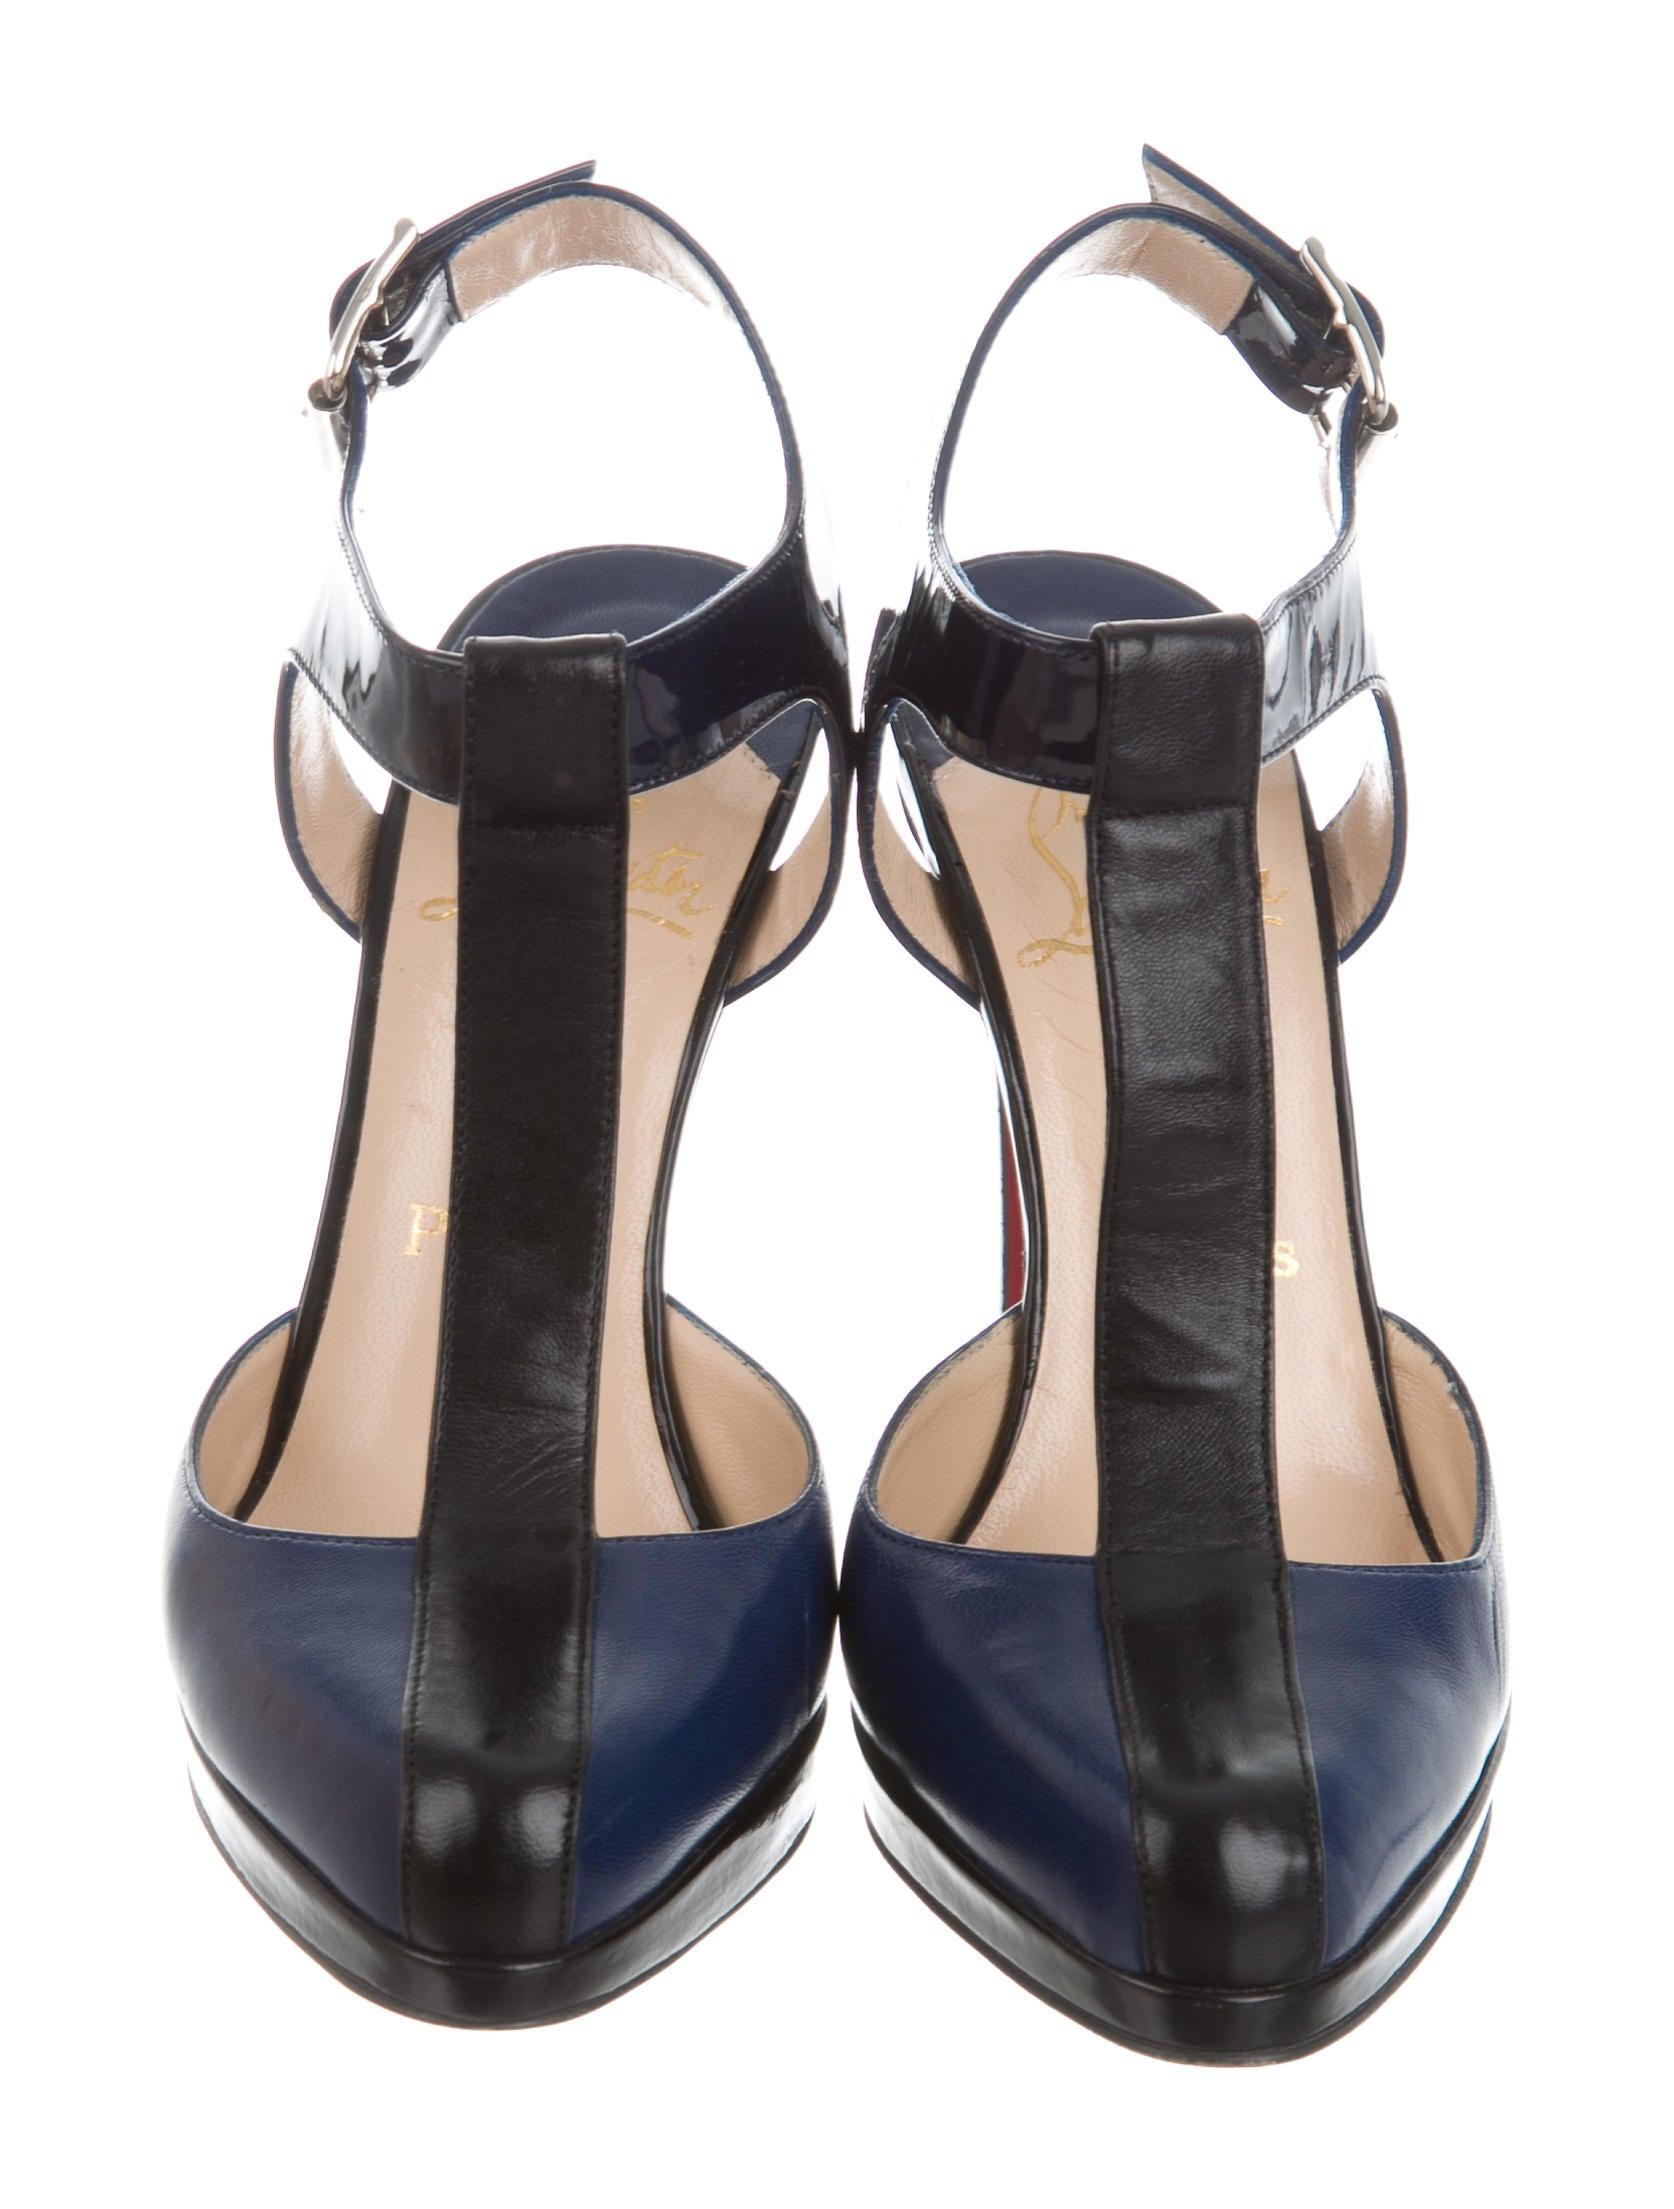 christian louboutin platform t strap pumps shoes cht68231 the realreal. Black Bedroom Furniture Sets. Home Design Ideas